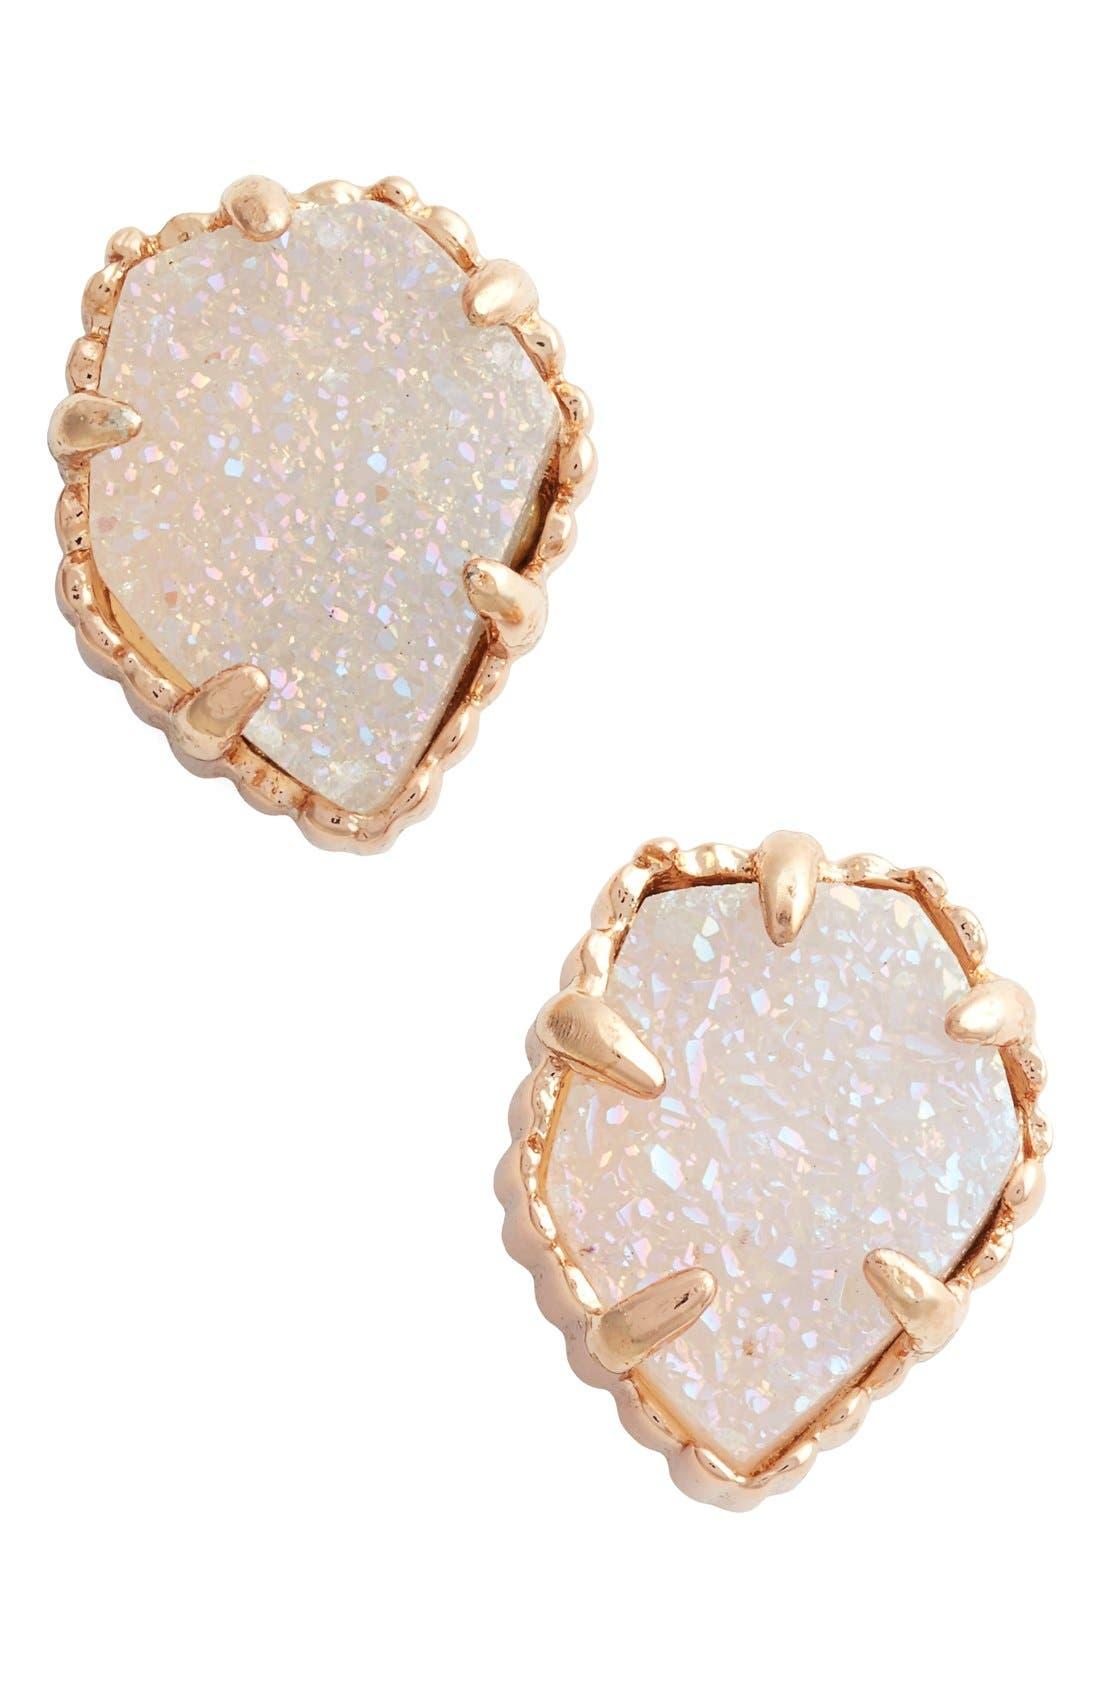 Tessa Stone Stud Earrings,                         Main,                         color, IRIDESCENT DRUSY/ ROSE GOLD